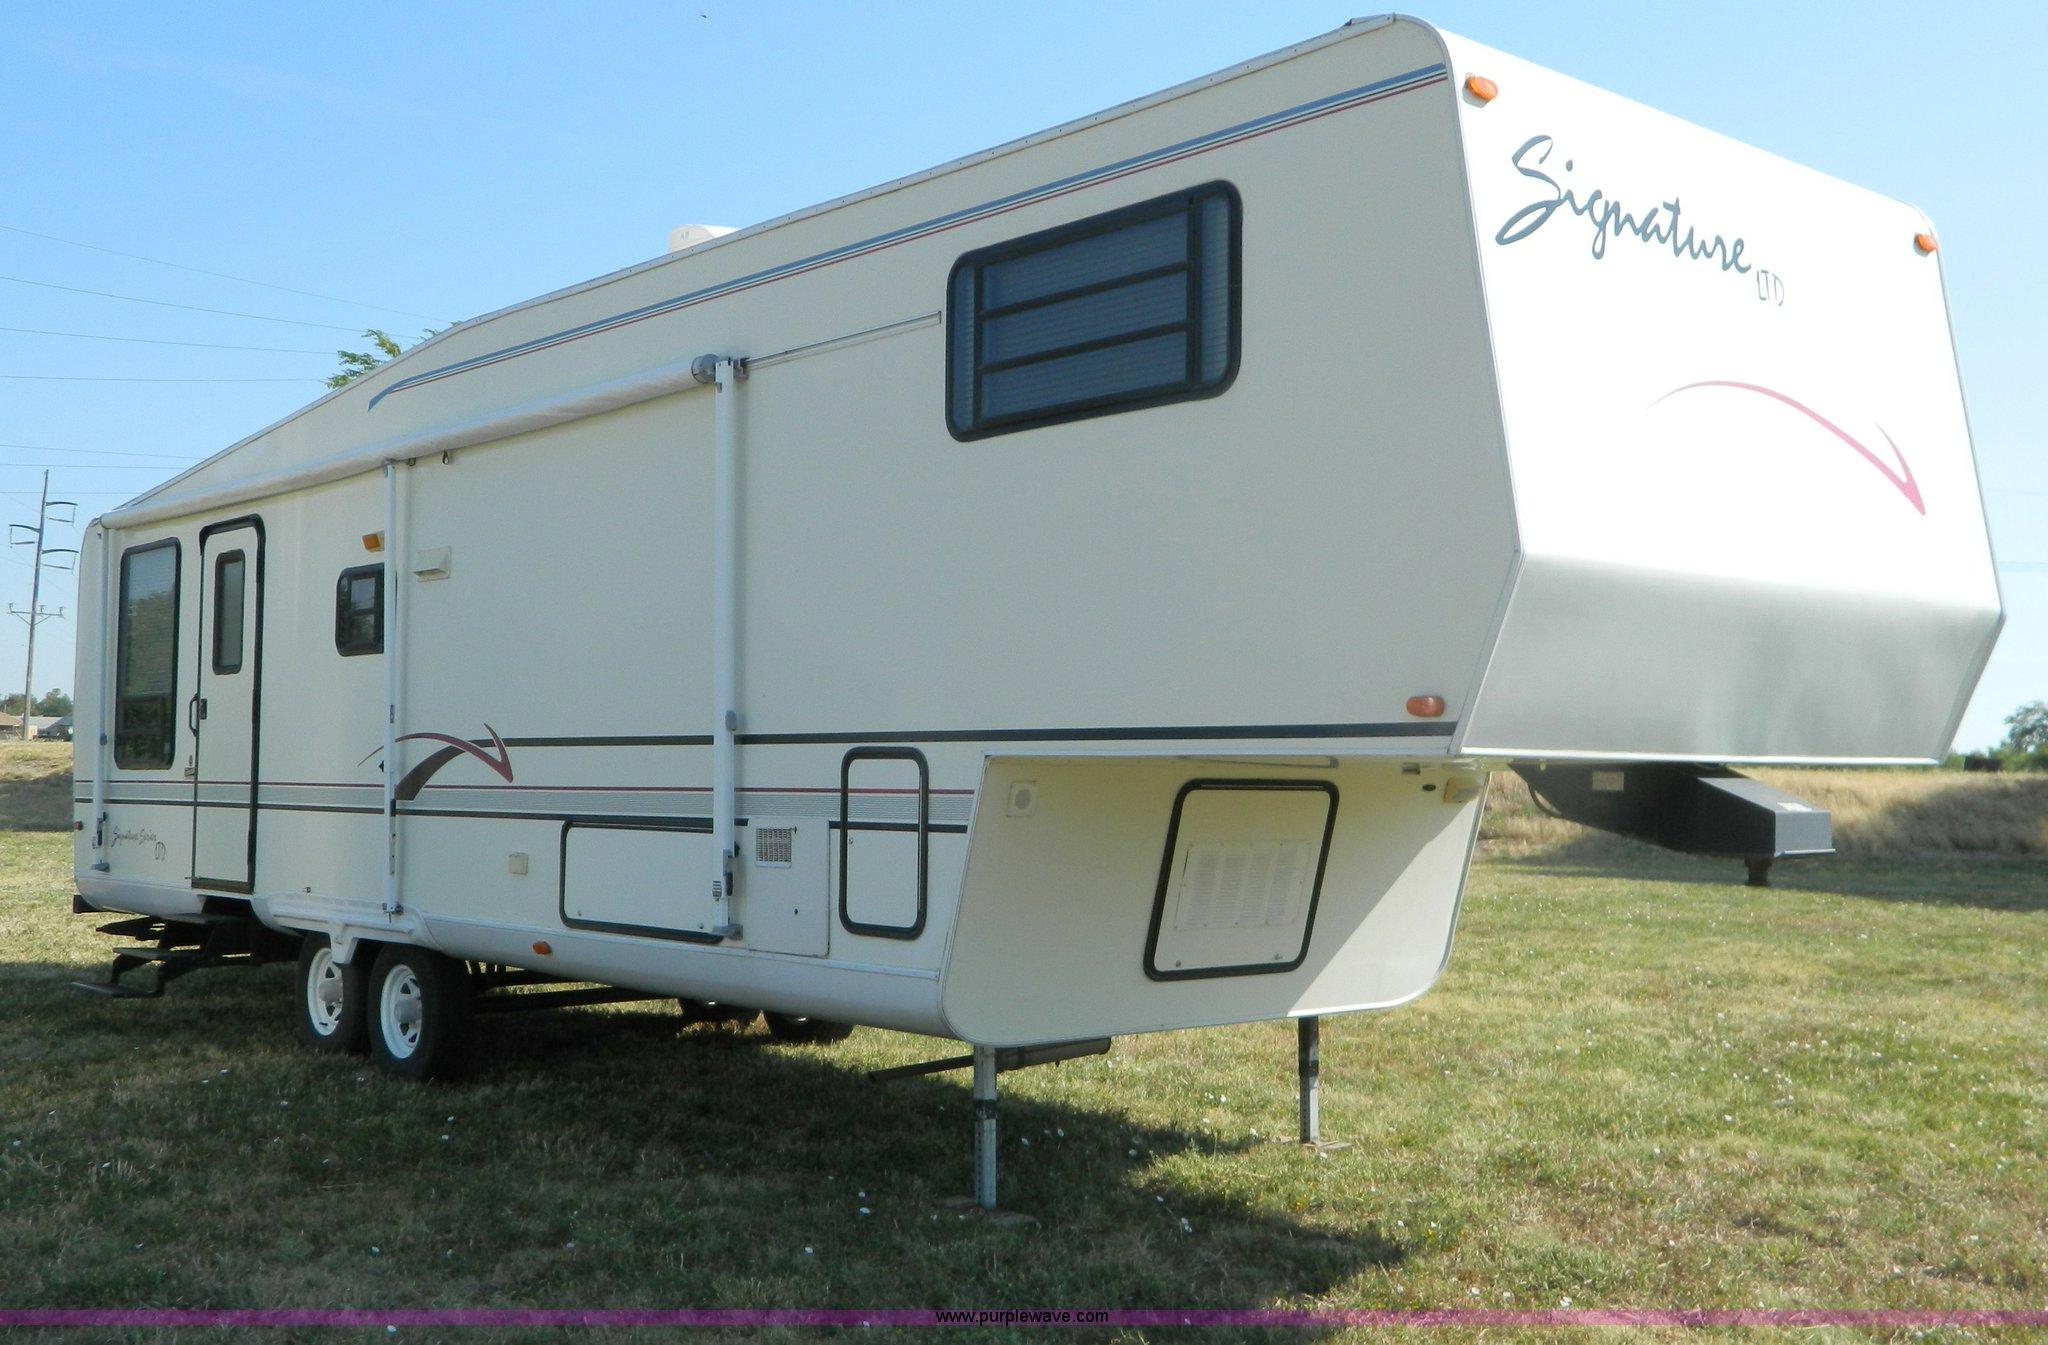 1996 Dutchmen Signature LTD 33\' fifth wheel camper | Item B3...